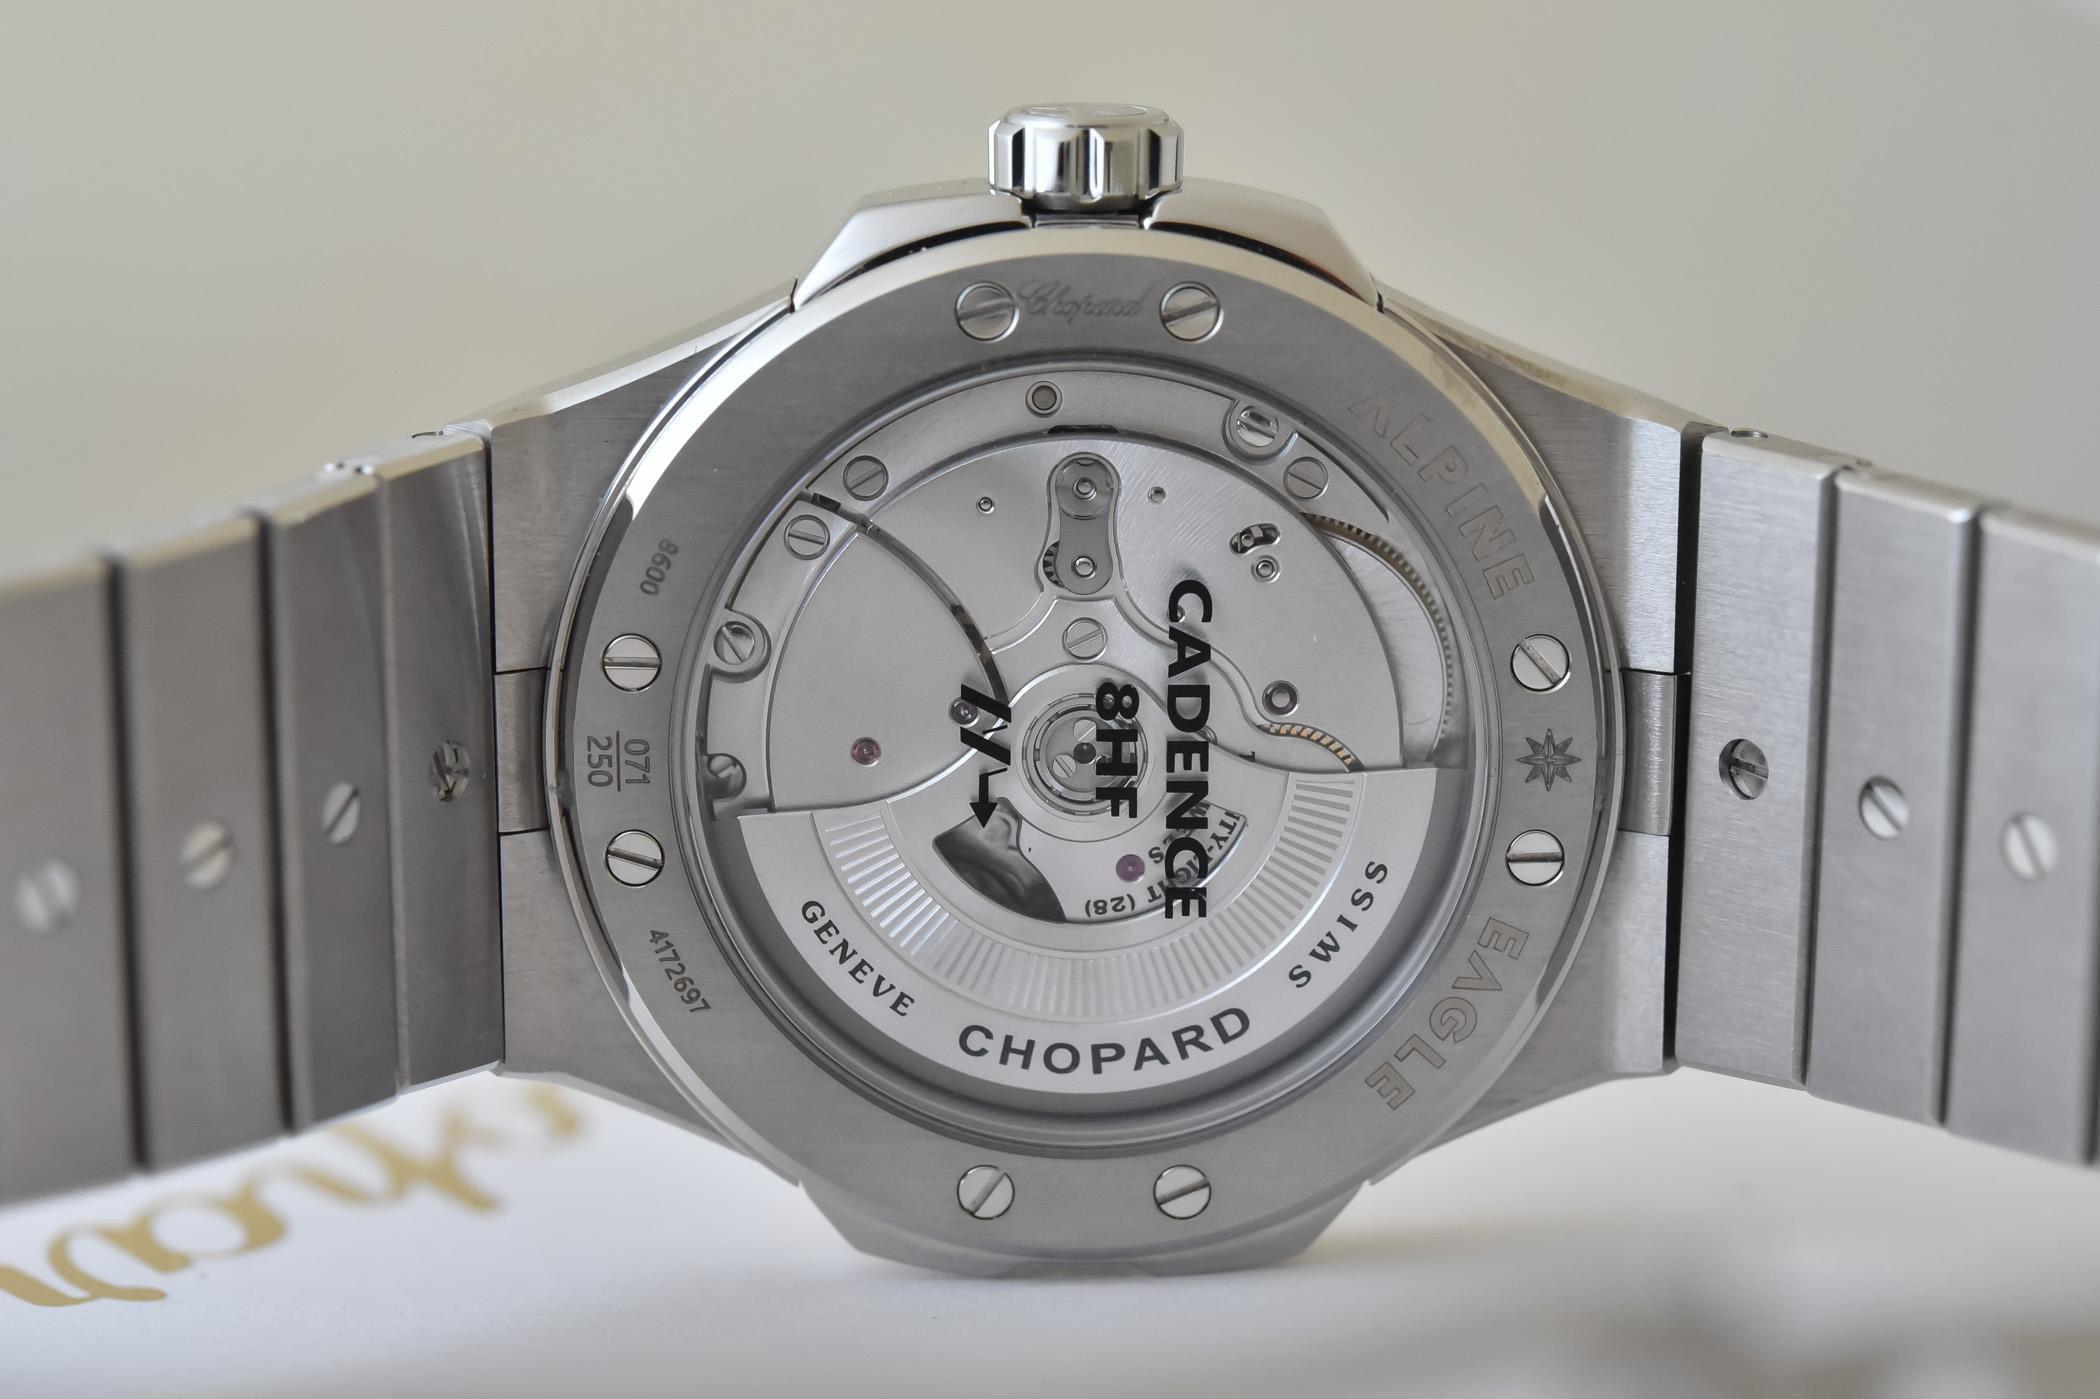 Chopard Alpine Eagle Cadence 8HF Titanium Limited Edition